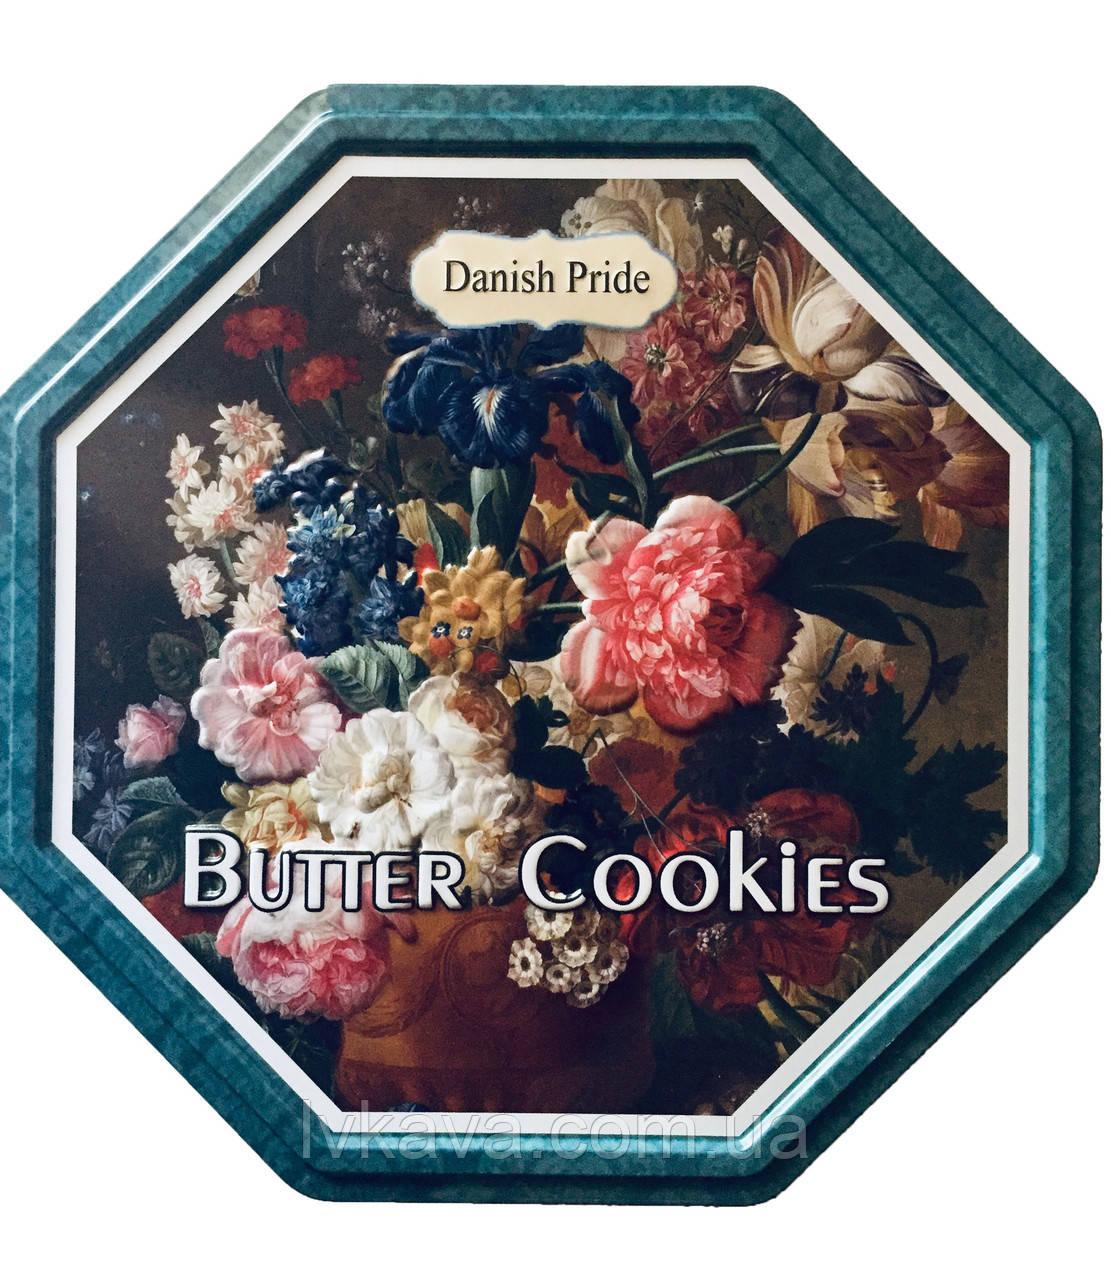 Печенье ассорти Butter cookies Букет цветов Danish Pride, 300 гр, ж\б